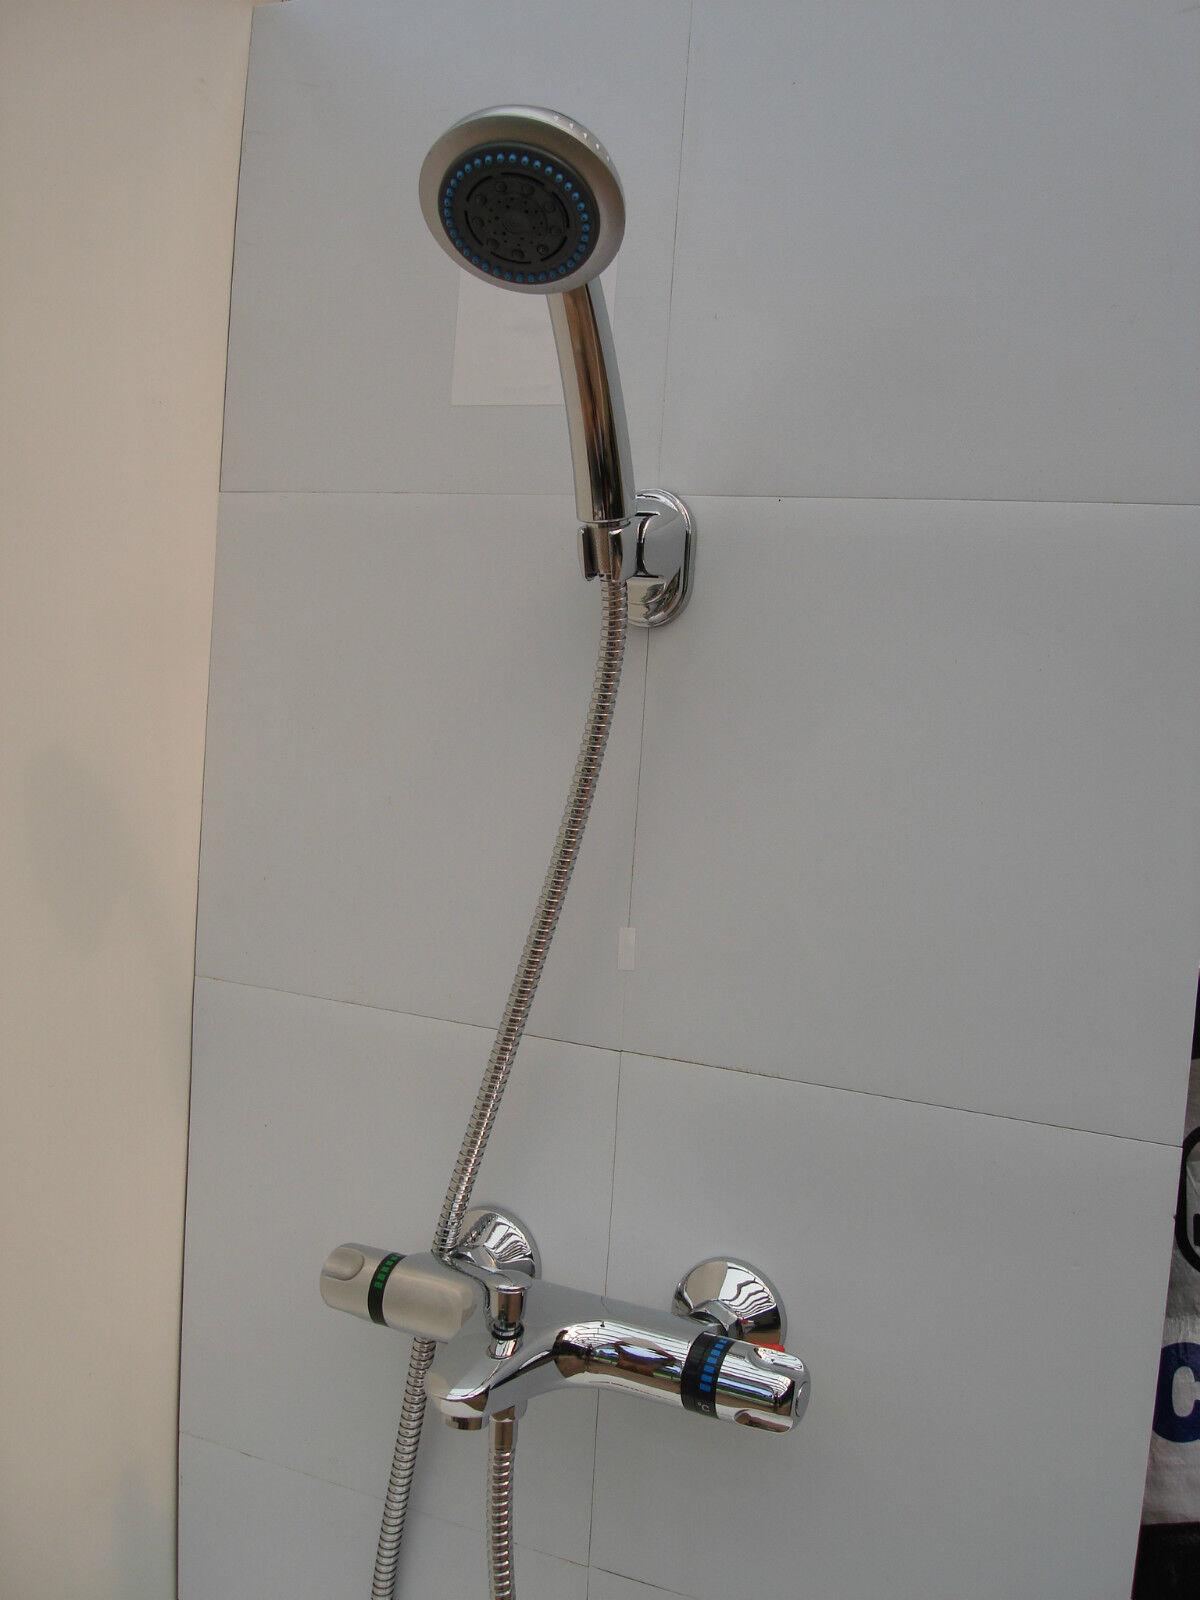 Thermostatique mural bain douche mélangeur robinet robinets, de poche, Tuyau, Support 064 013A